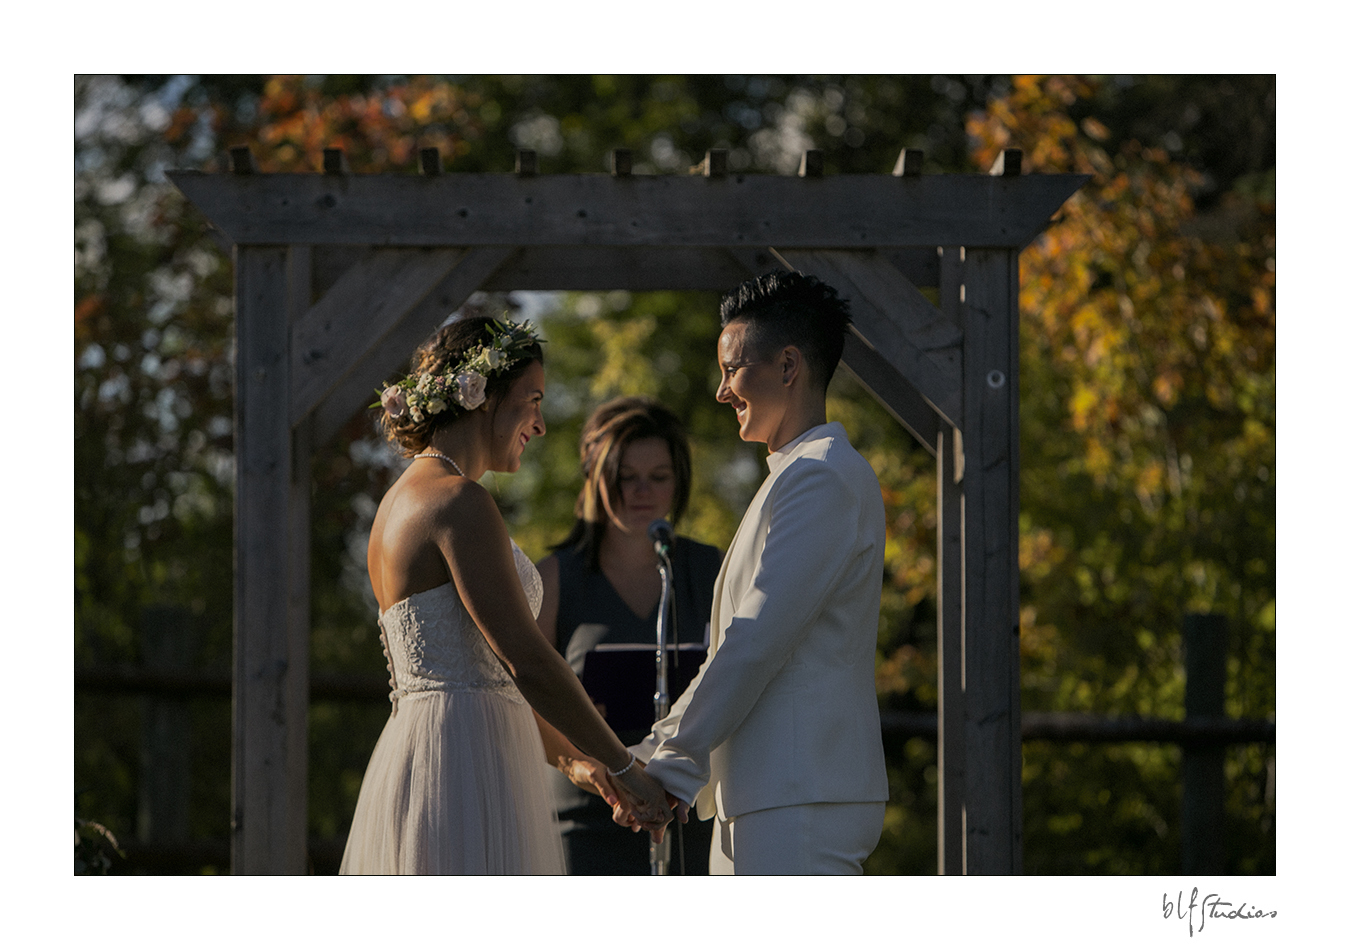 Winnipeg outdoor wedding ceremony venue